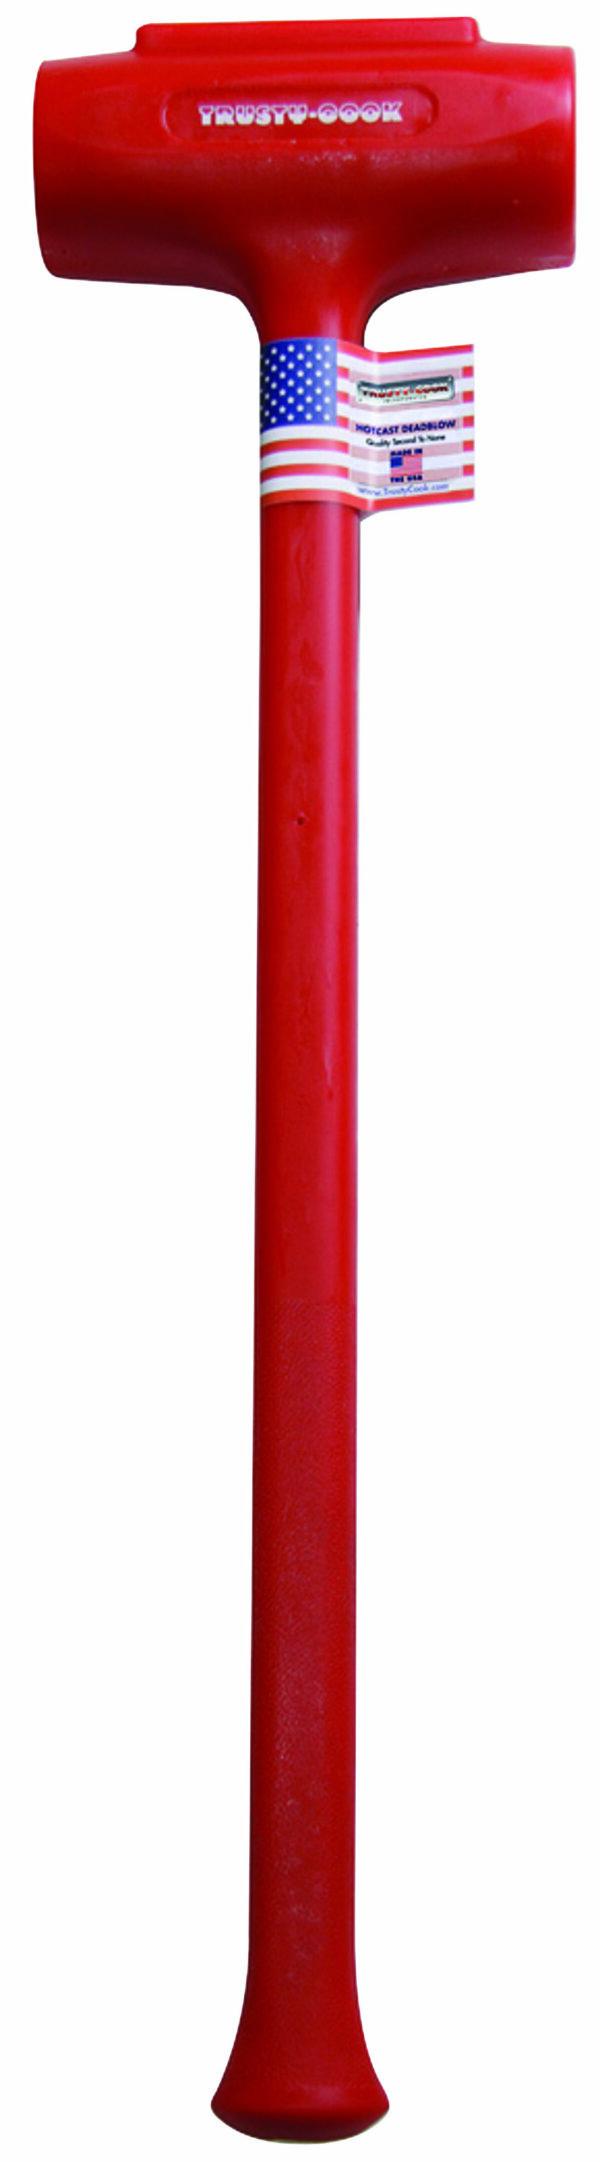 144 oz. Soft Face Polyurethane Dead Blow Sledge Hammer